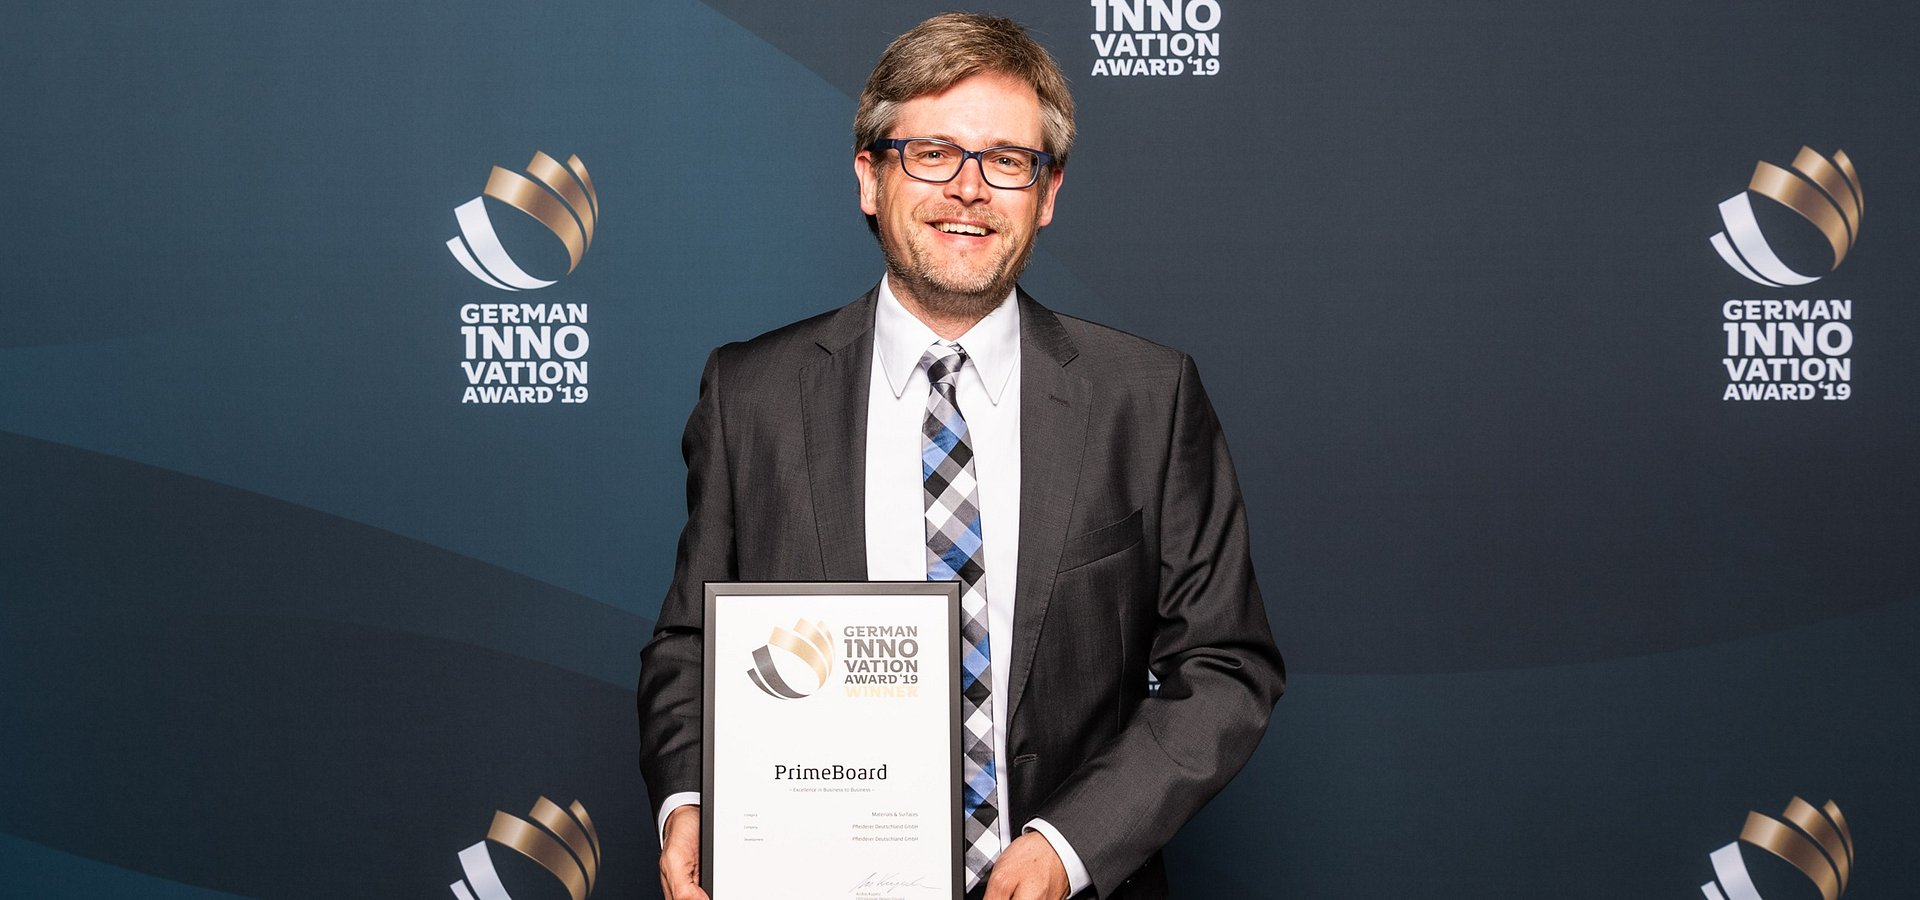 Płyta PrimeBoard nagrodzona German Innovation Award 2019